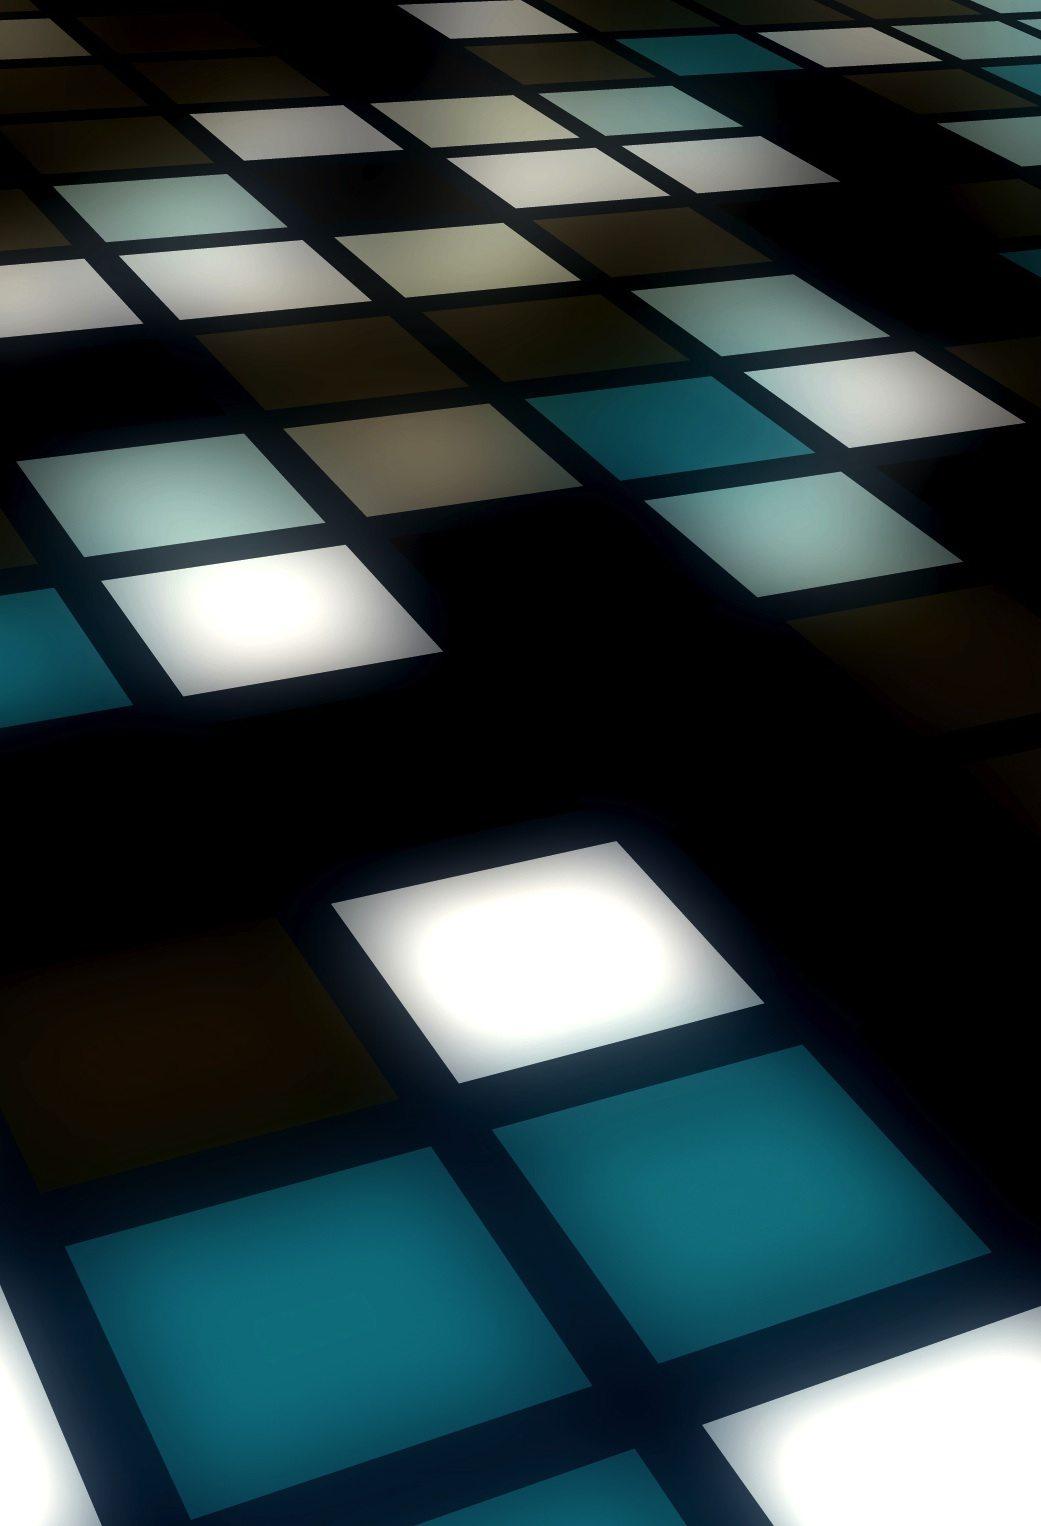 Dynamic wallpaper for iphone - SF Wallpaper